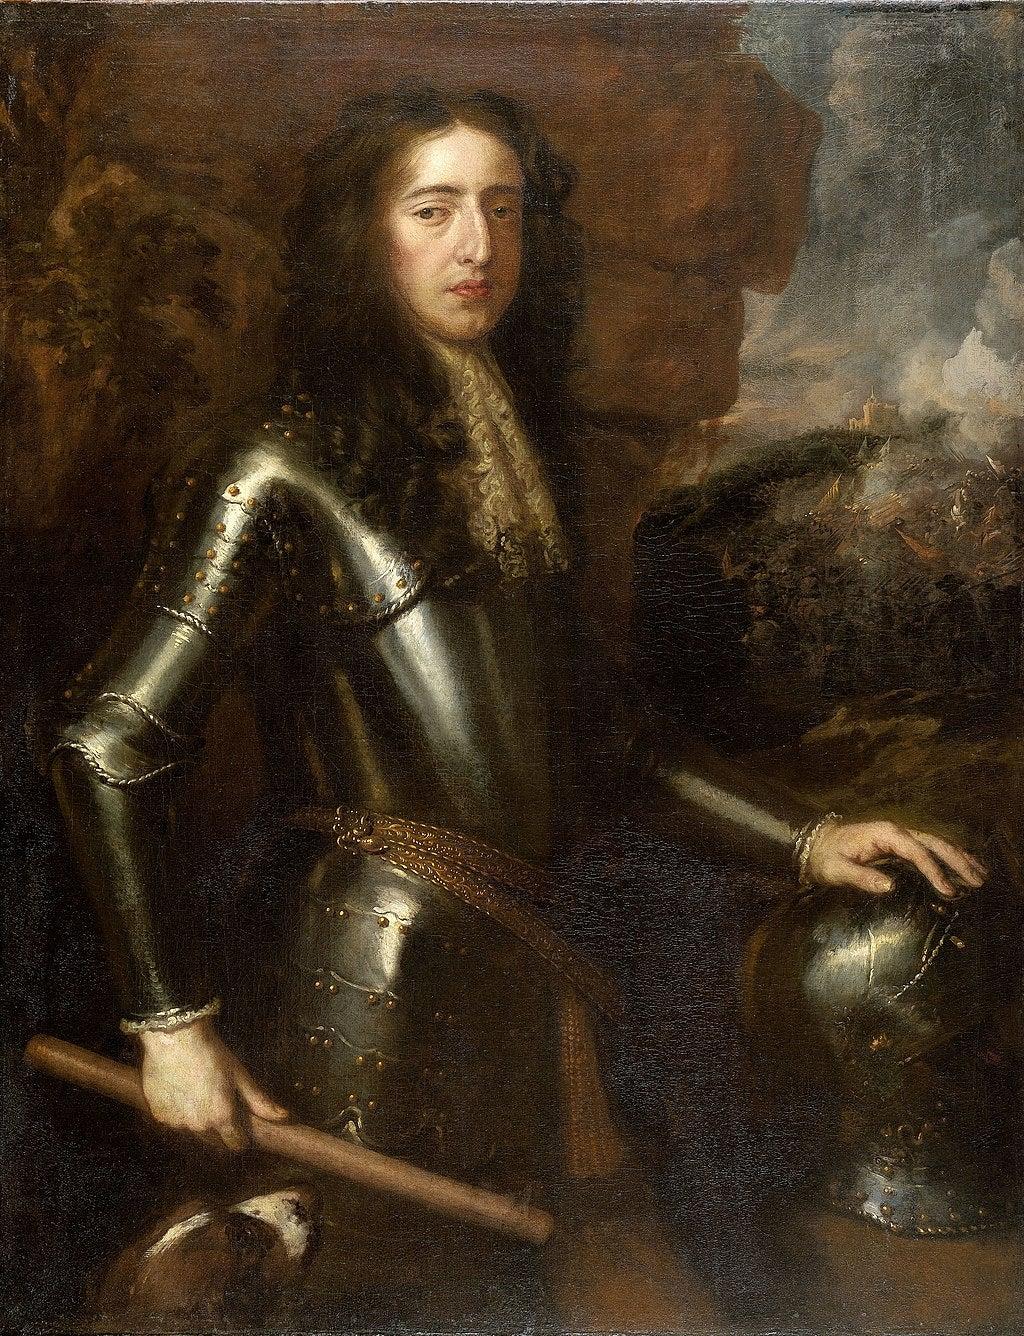 A painting of William III of England - William of Orange